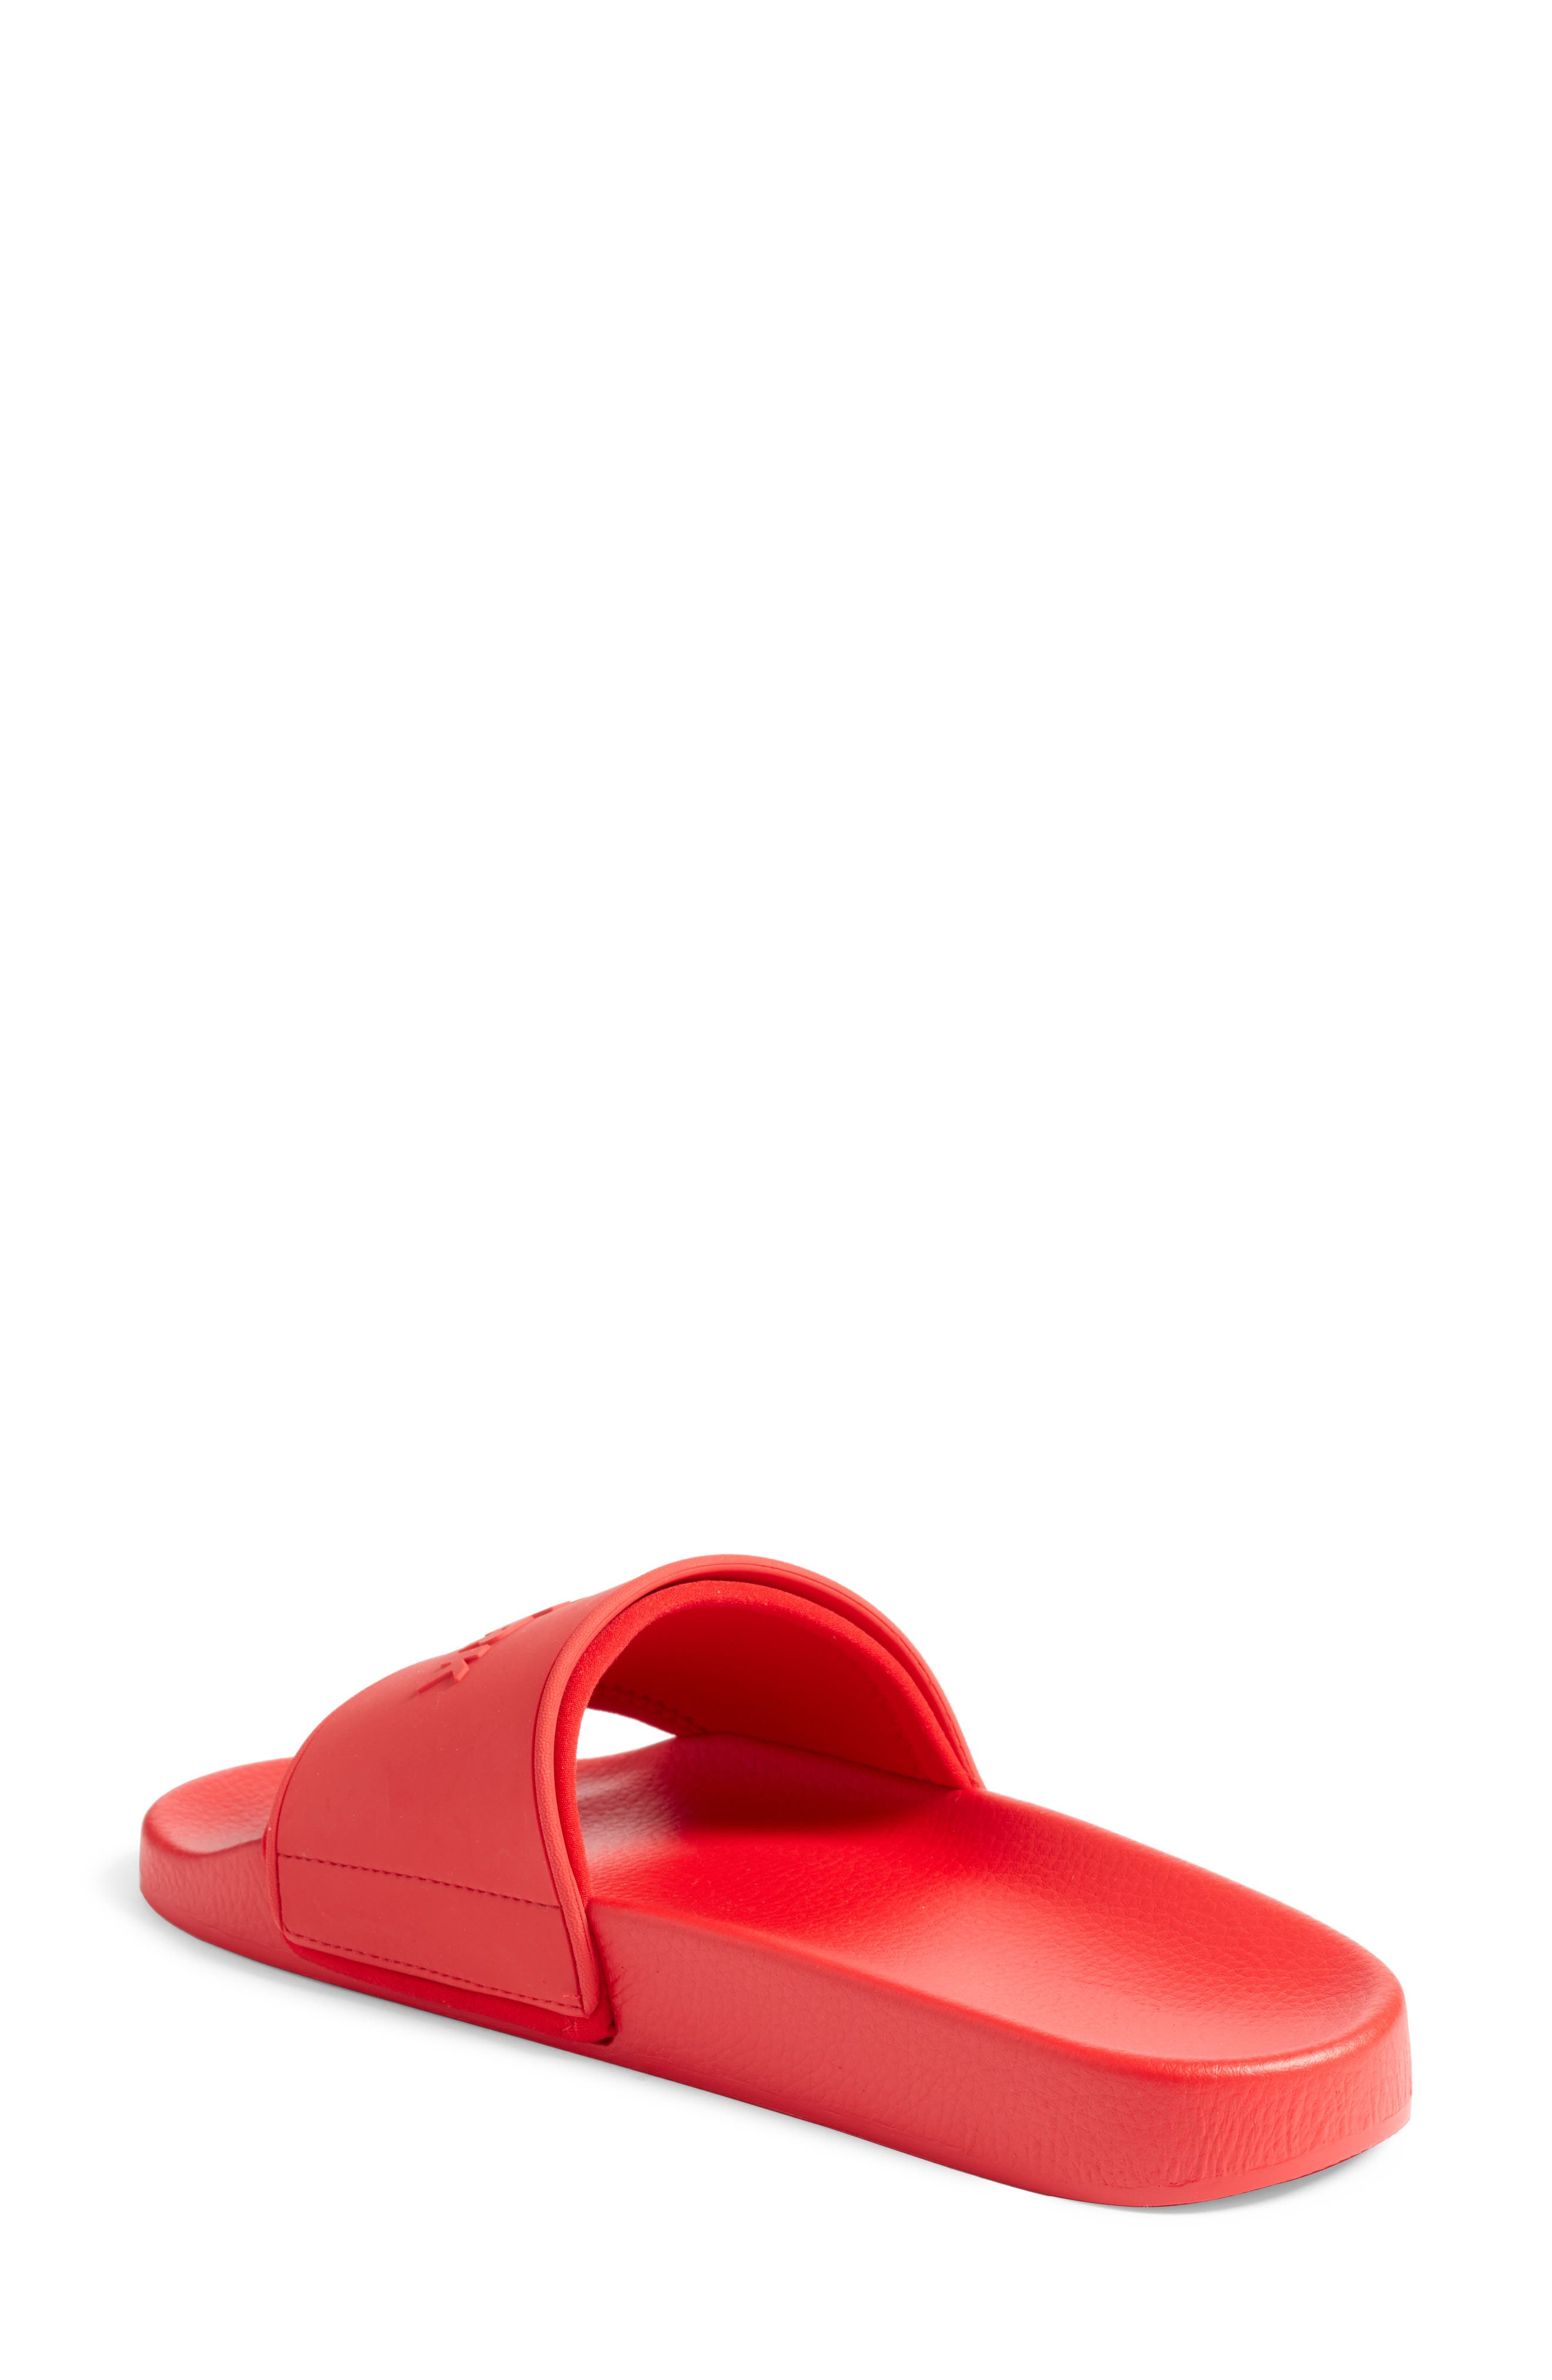 IVY PARK<SUP>®</SUP>, Embossed Logo Slide Sandal, Alternate thumbnail 2, color, 600